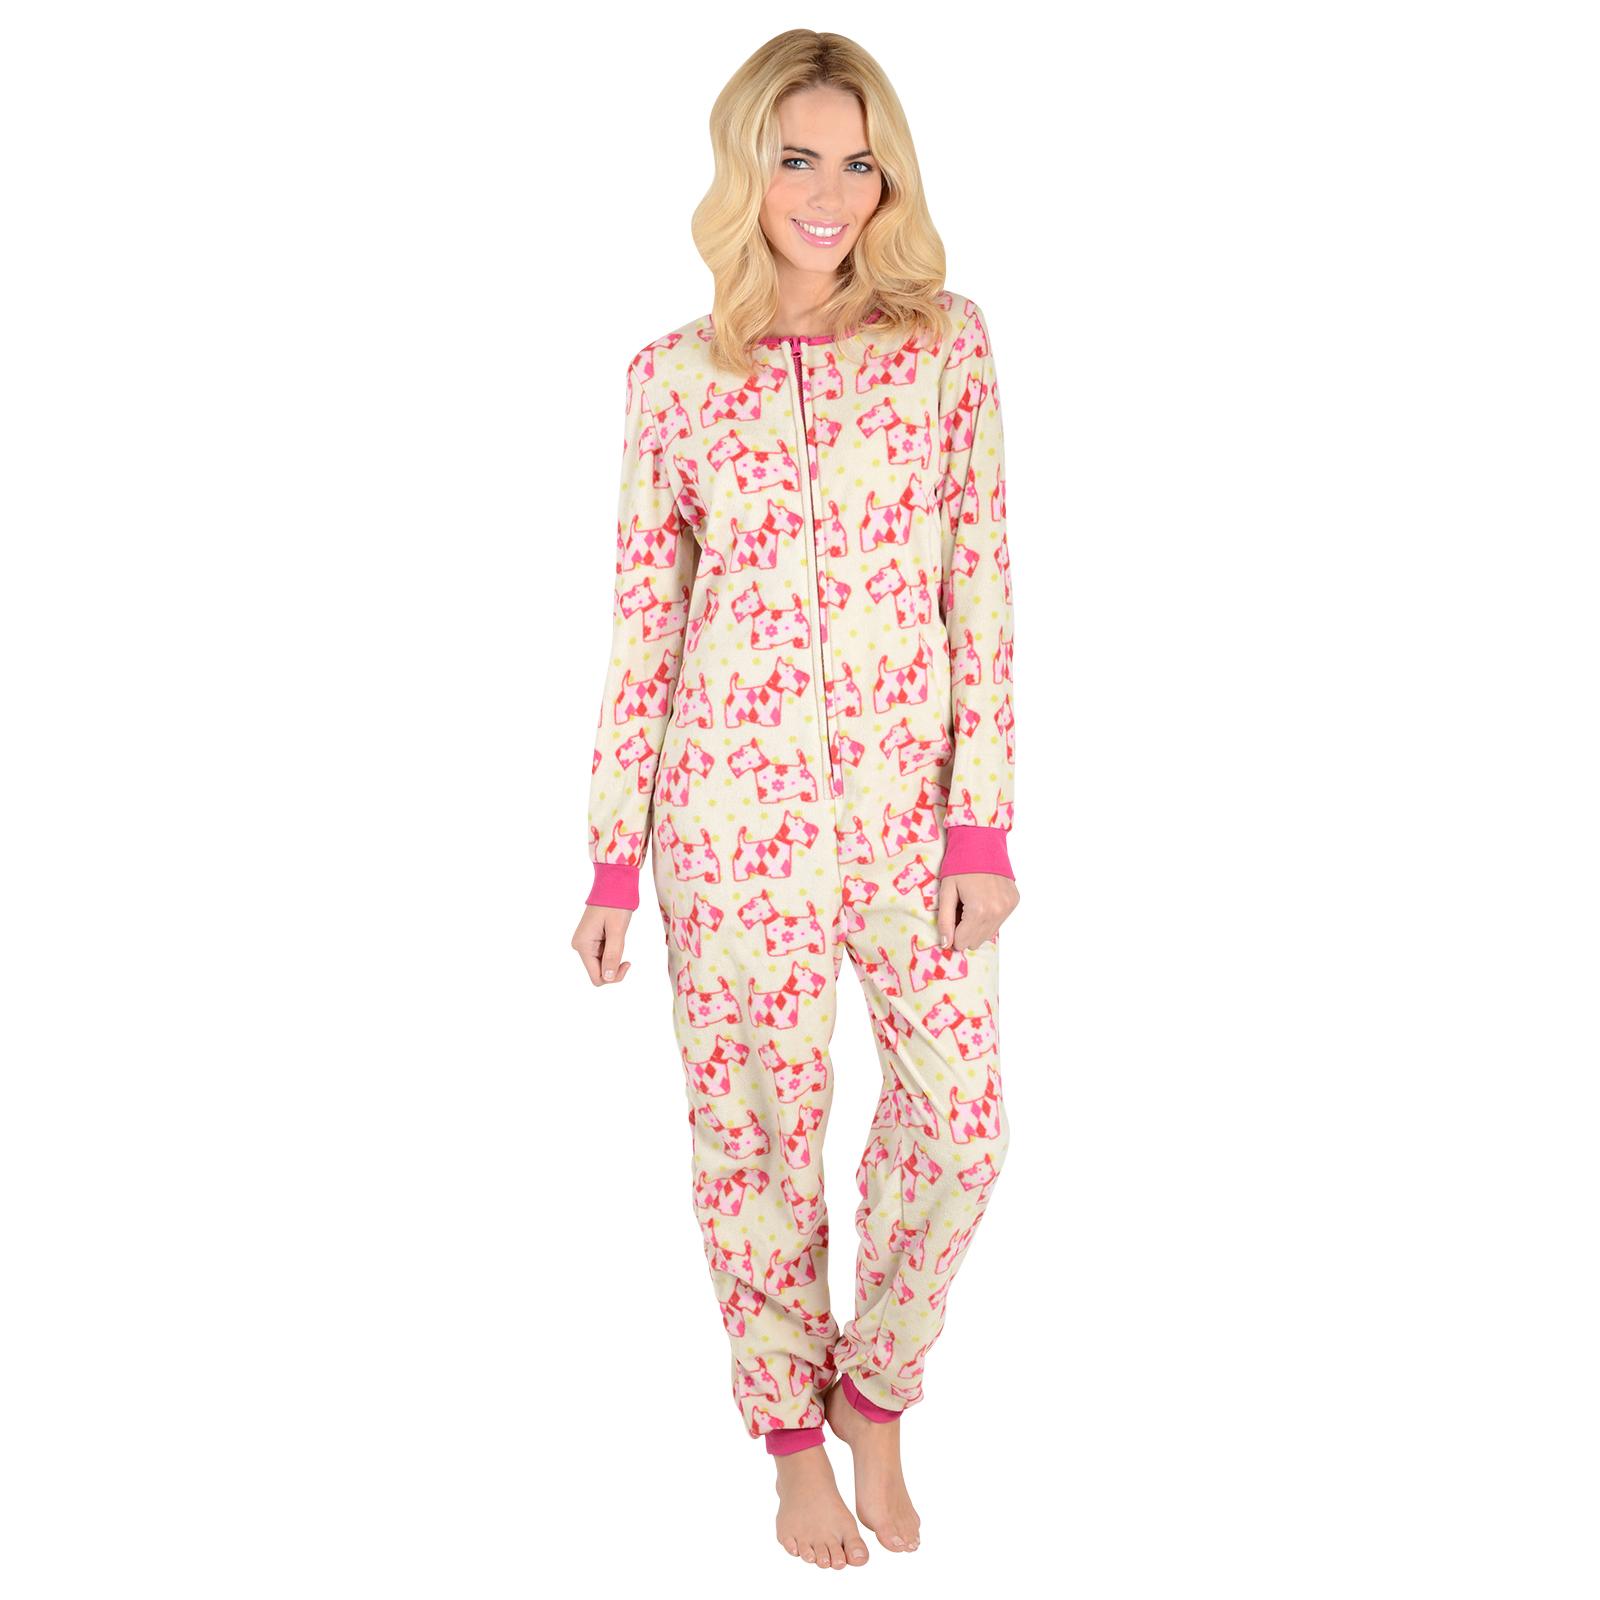 ladies fleece all in one piece pyjamas jump sleep suit pjs nightwear new ebay. Black Bedroom Furniture Sets. Home Design Ideas